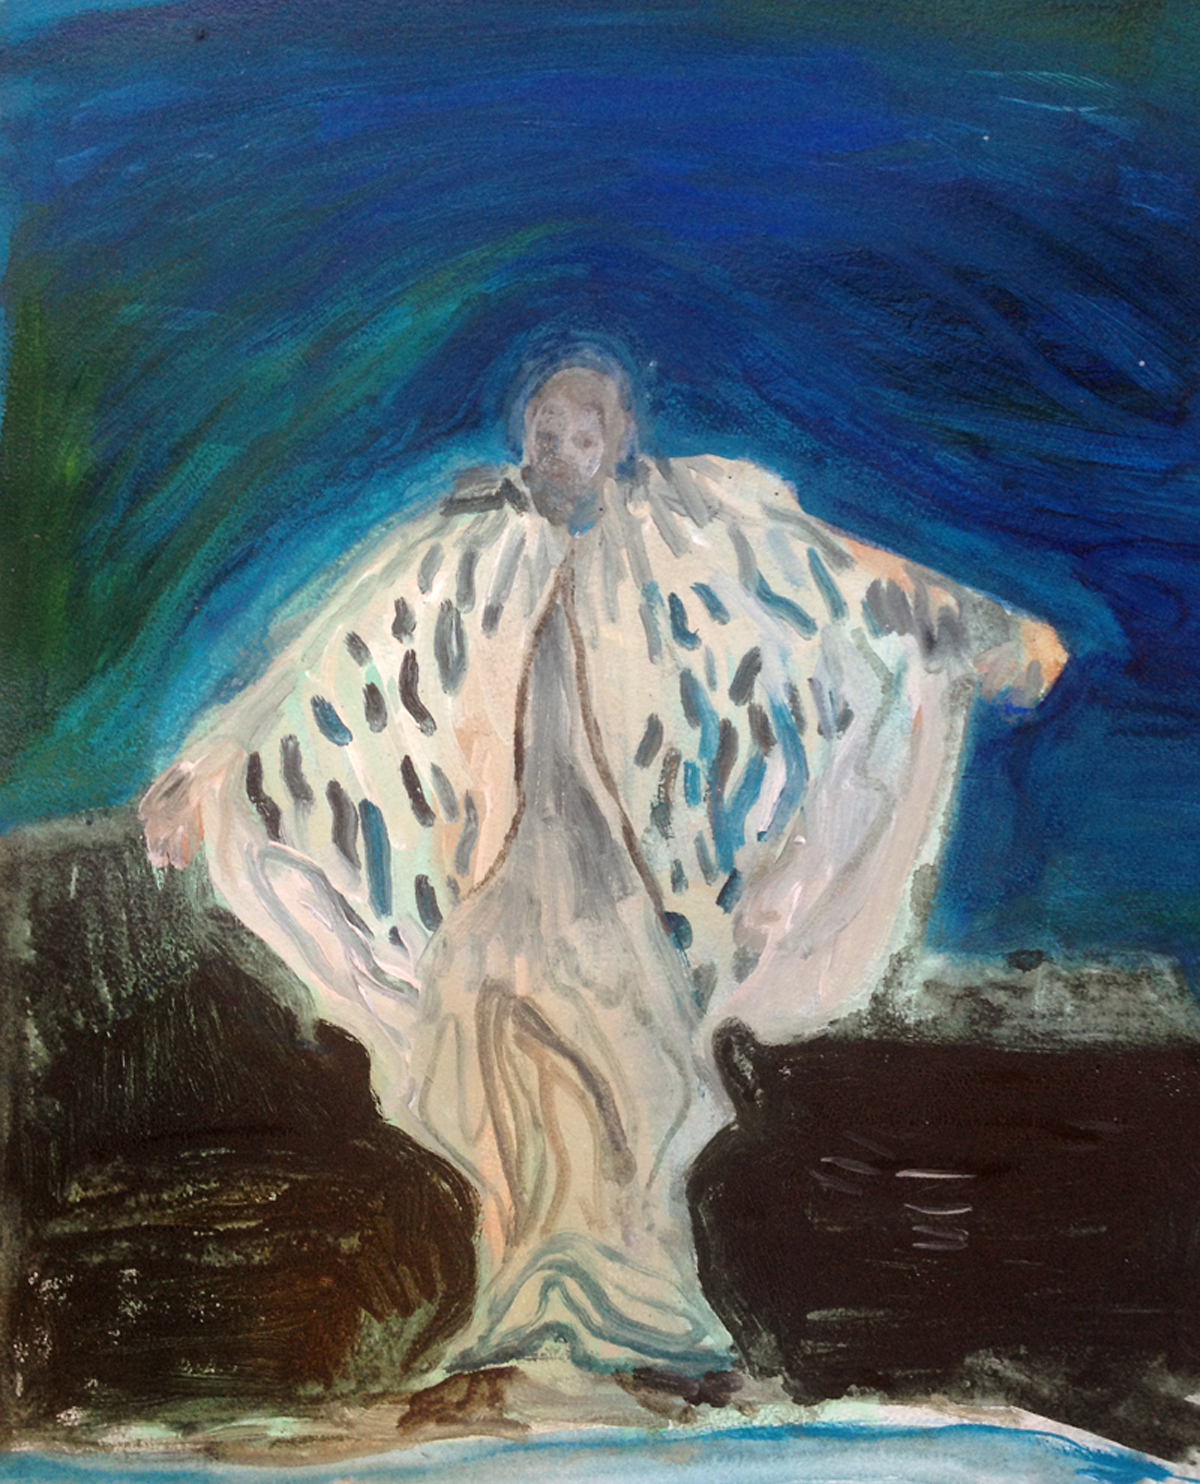 Justin Williams, Baba Desi , 2015, oil on paper, 43 x 53cm